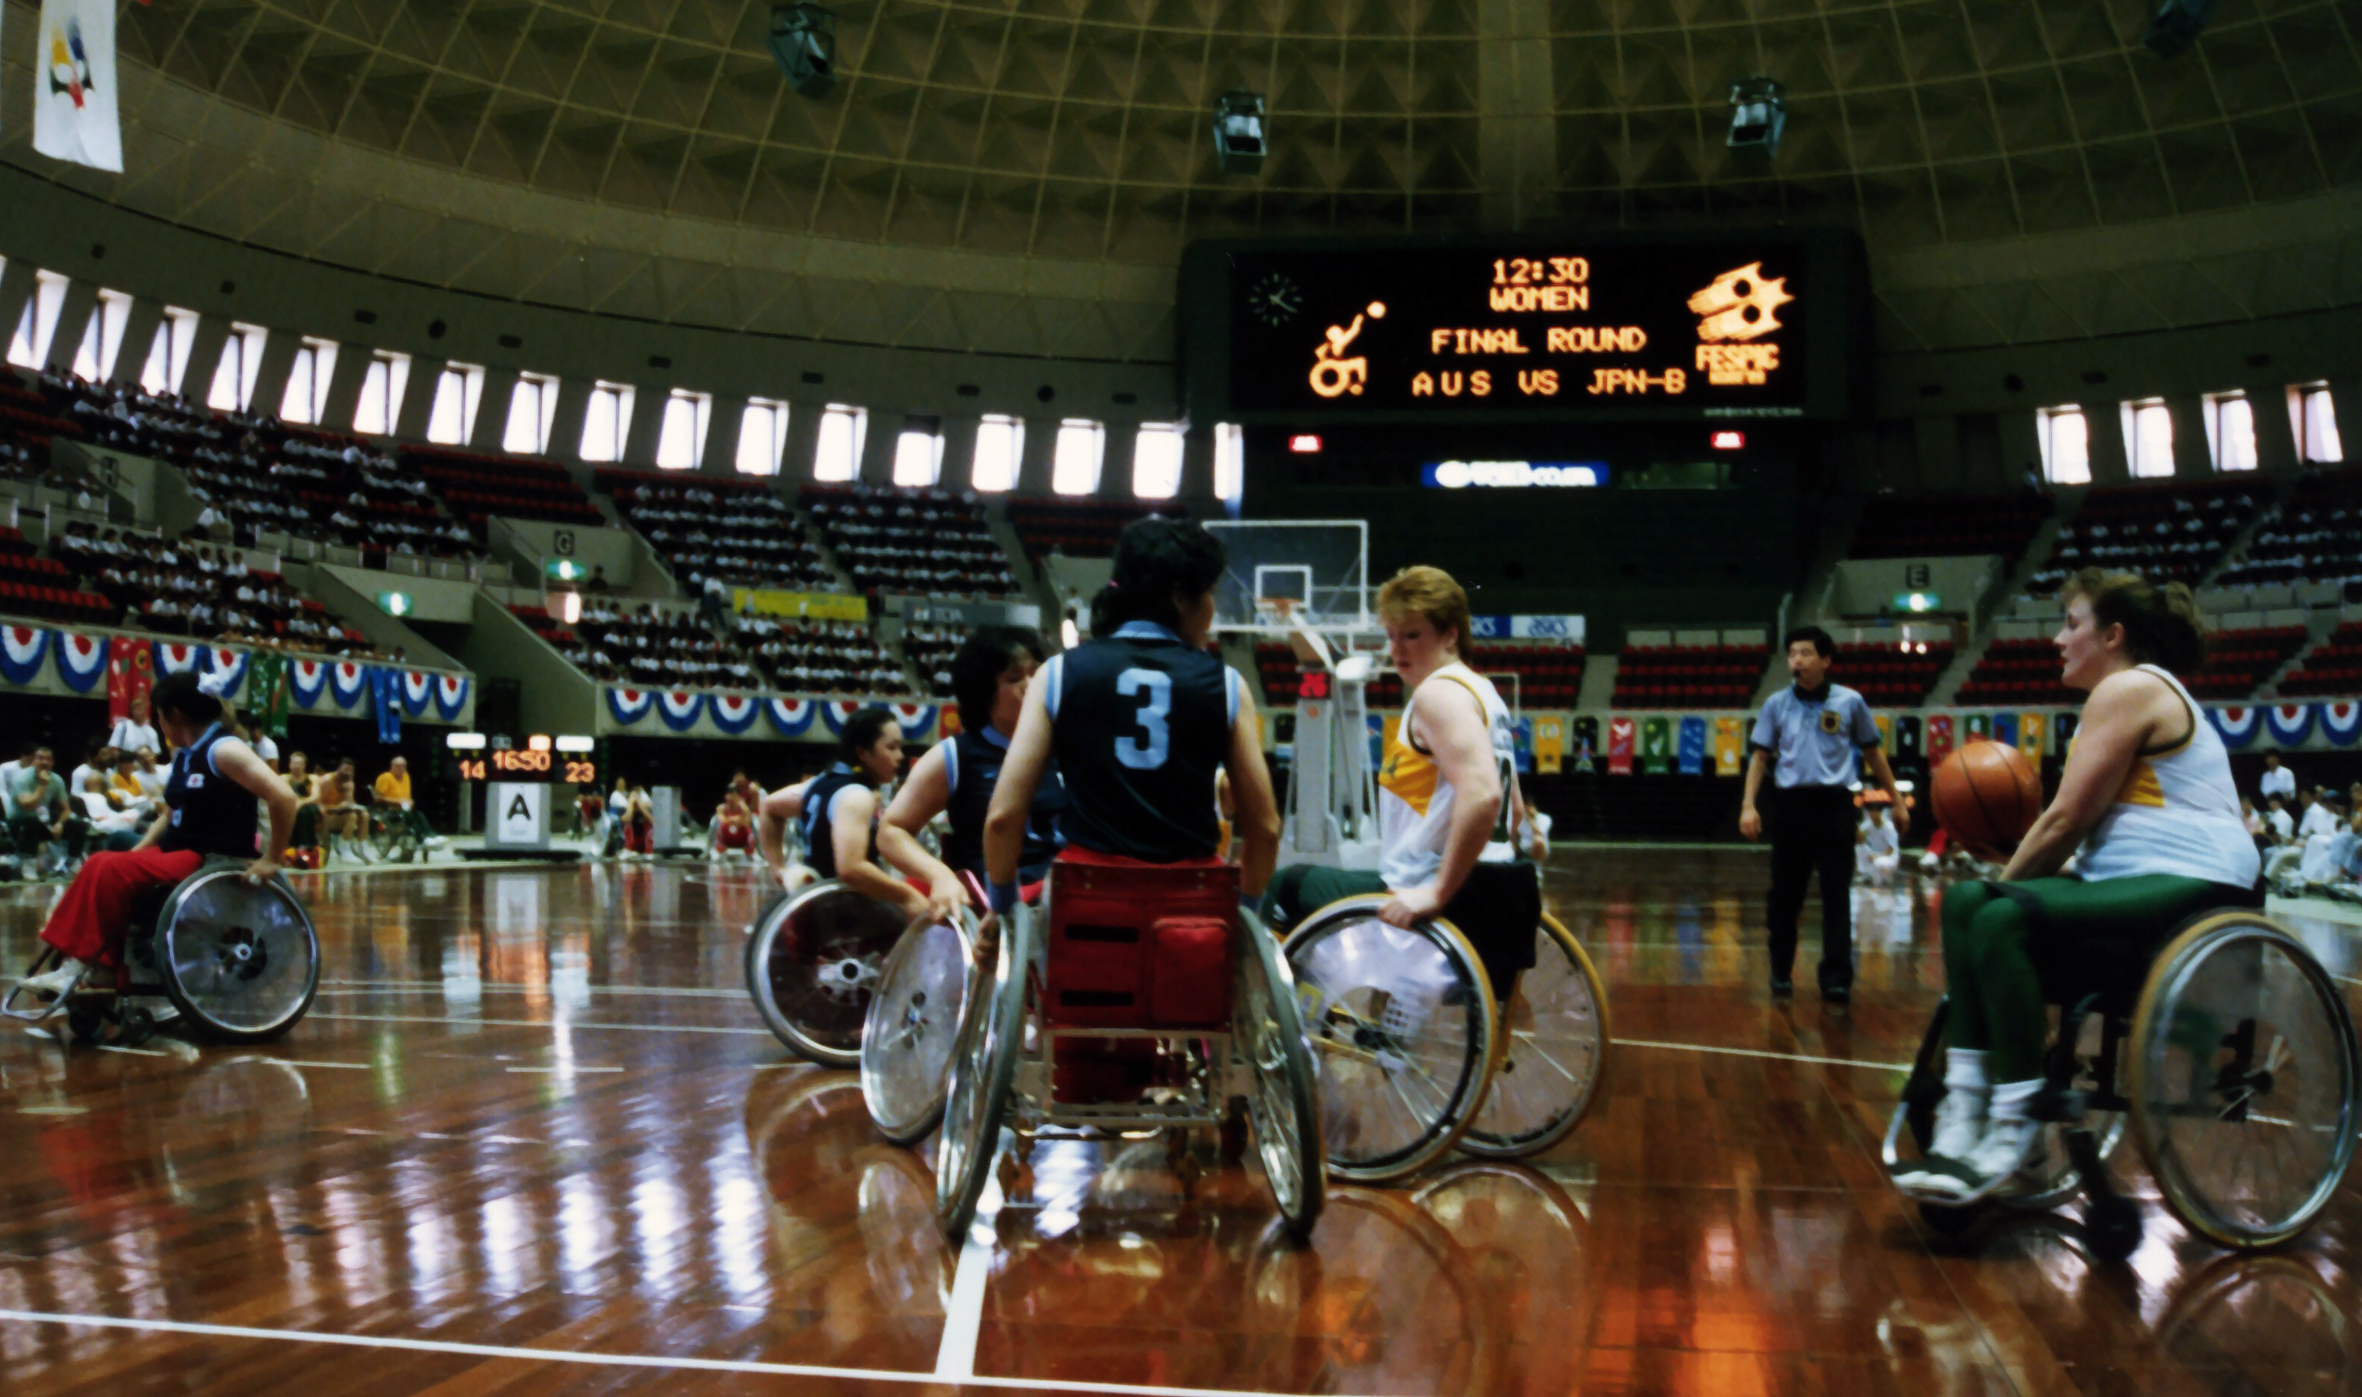 File XX0989 - Kobe FESPIC Womens Wheelchair Basketball Final Round - 1 of 11  - Scan - Crop.jpg 452d85da6